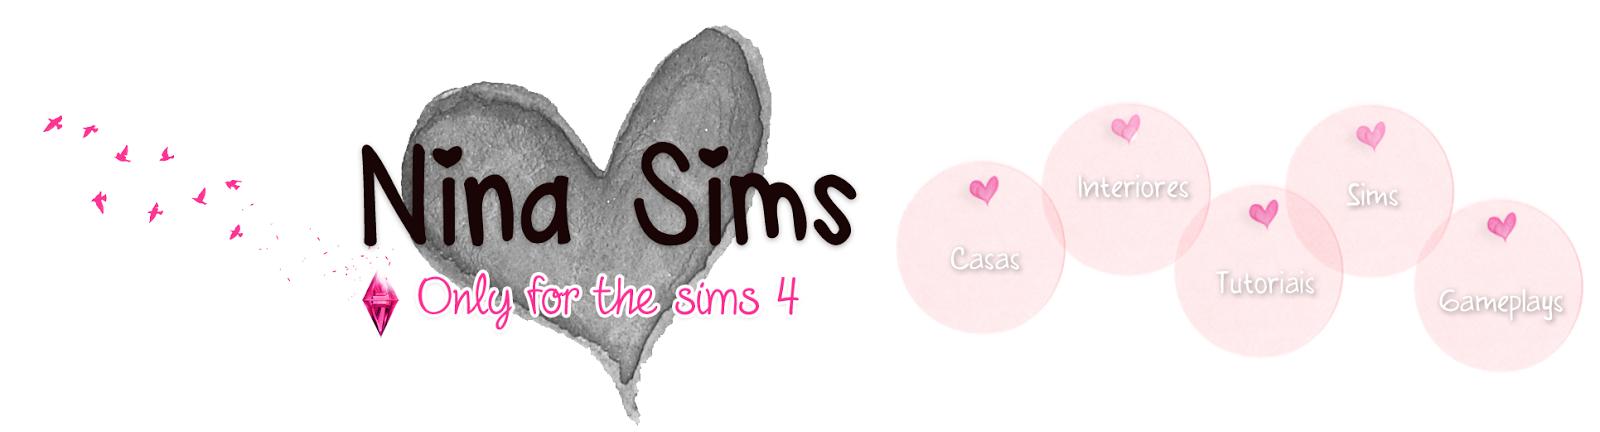 Niina Sims